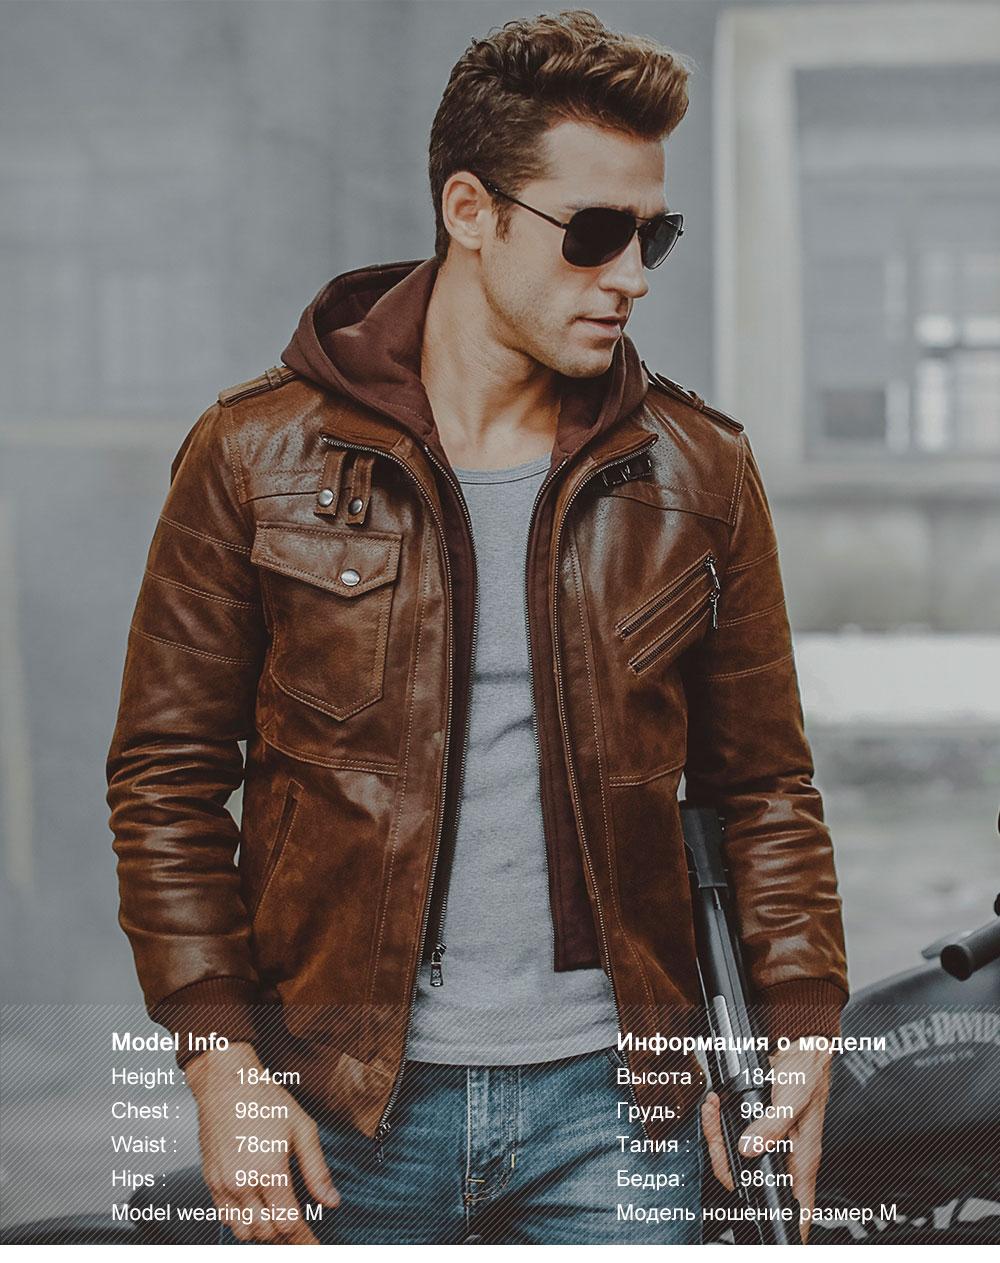 HTB1pGM0X0zvK1RkSnfoq6zMwVXa5 Men's Real Leather Jacket Men Motorcycle Removable Hood winter coat Men Warm Genuine Leather Jackets